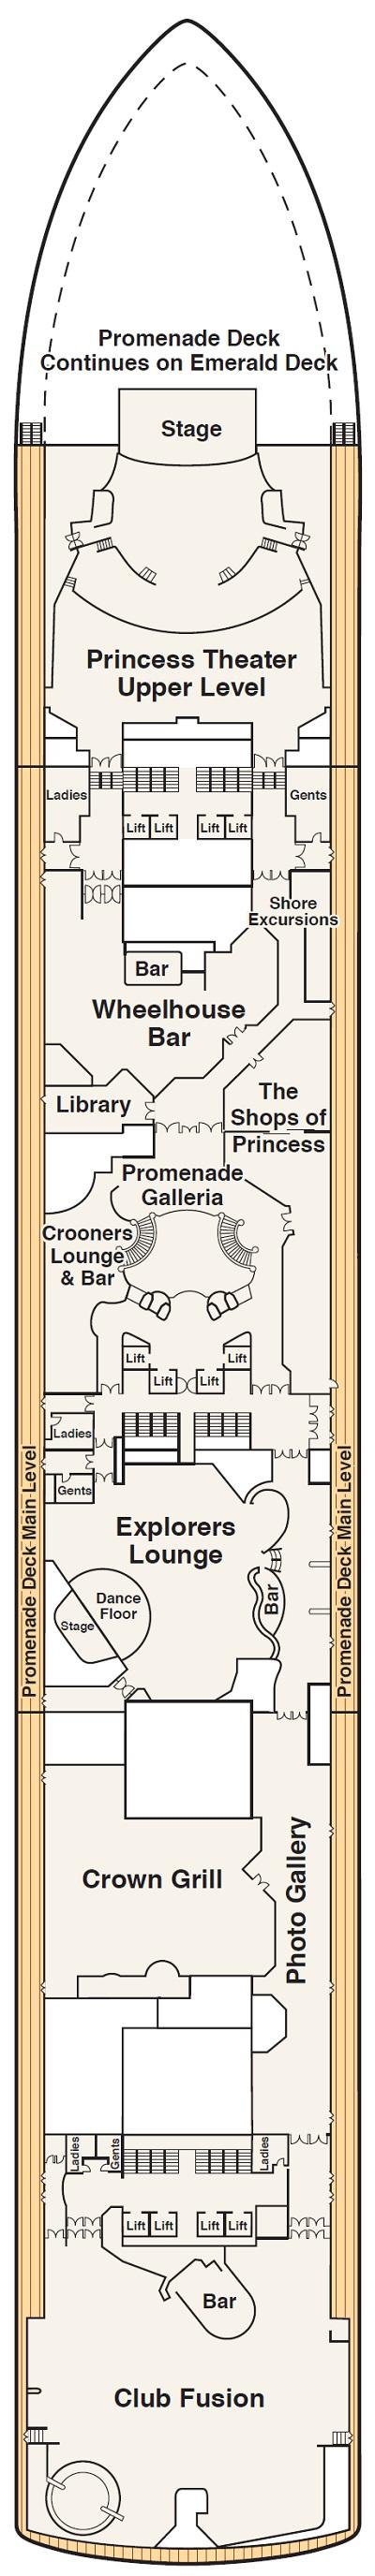 Deck 7 - Promenade